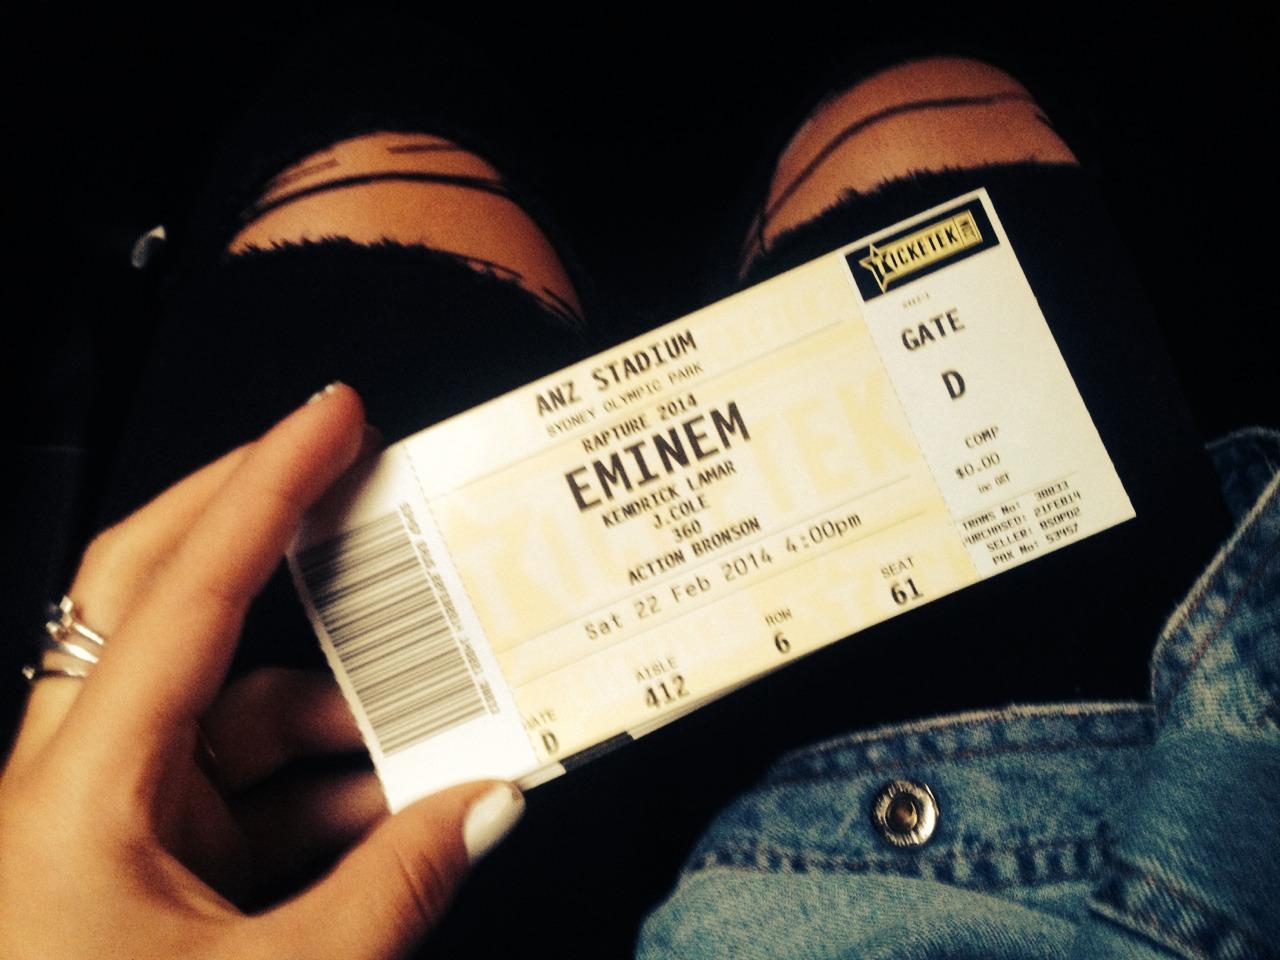 2014.02.22 - 01 - Eminem Rapture 2014 Sydney Australia, ANZ Stadium